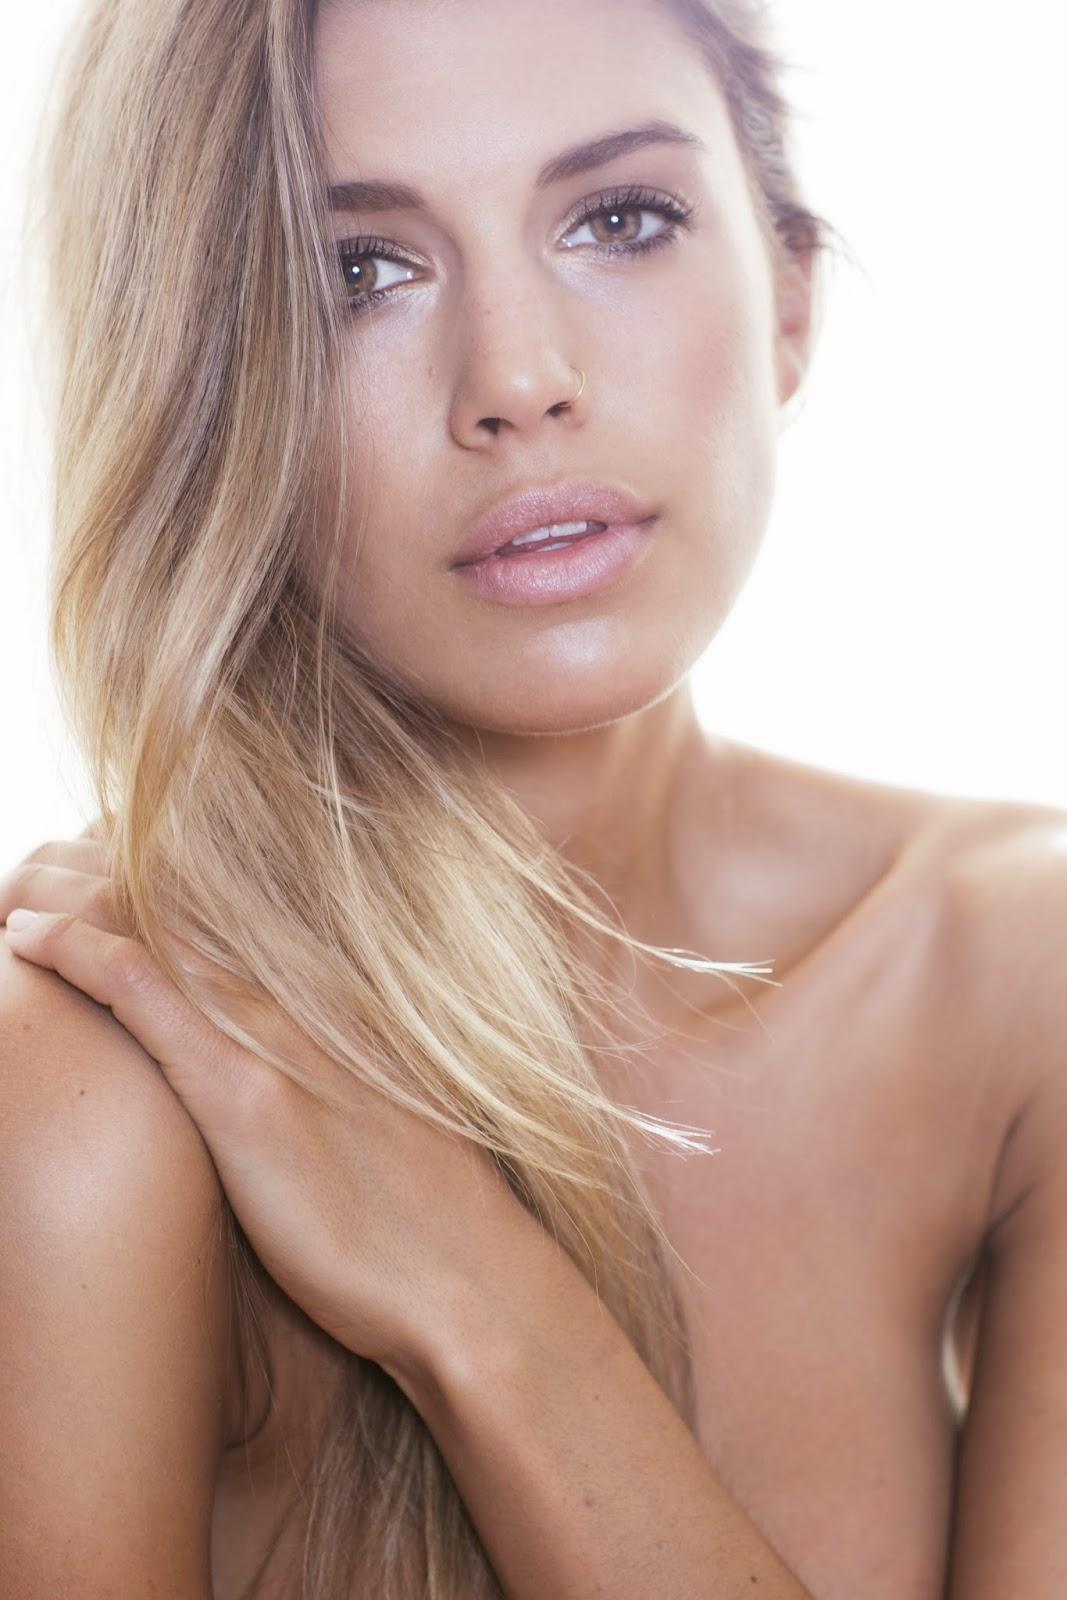 Monica Foley nude (23 photos), Sexy, Sideboobs, Selfie, butt 2017